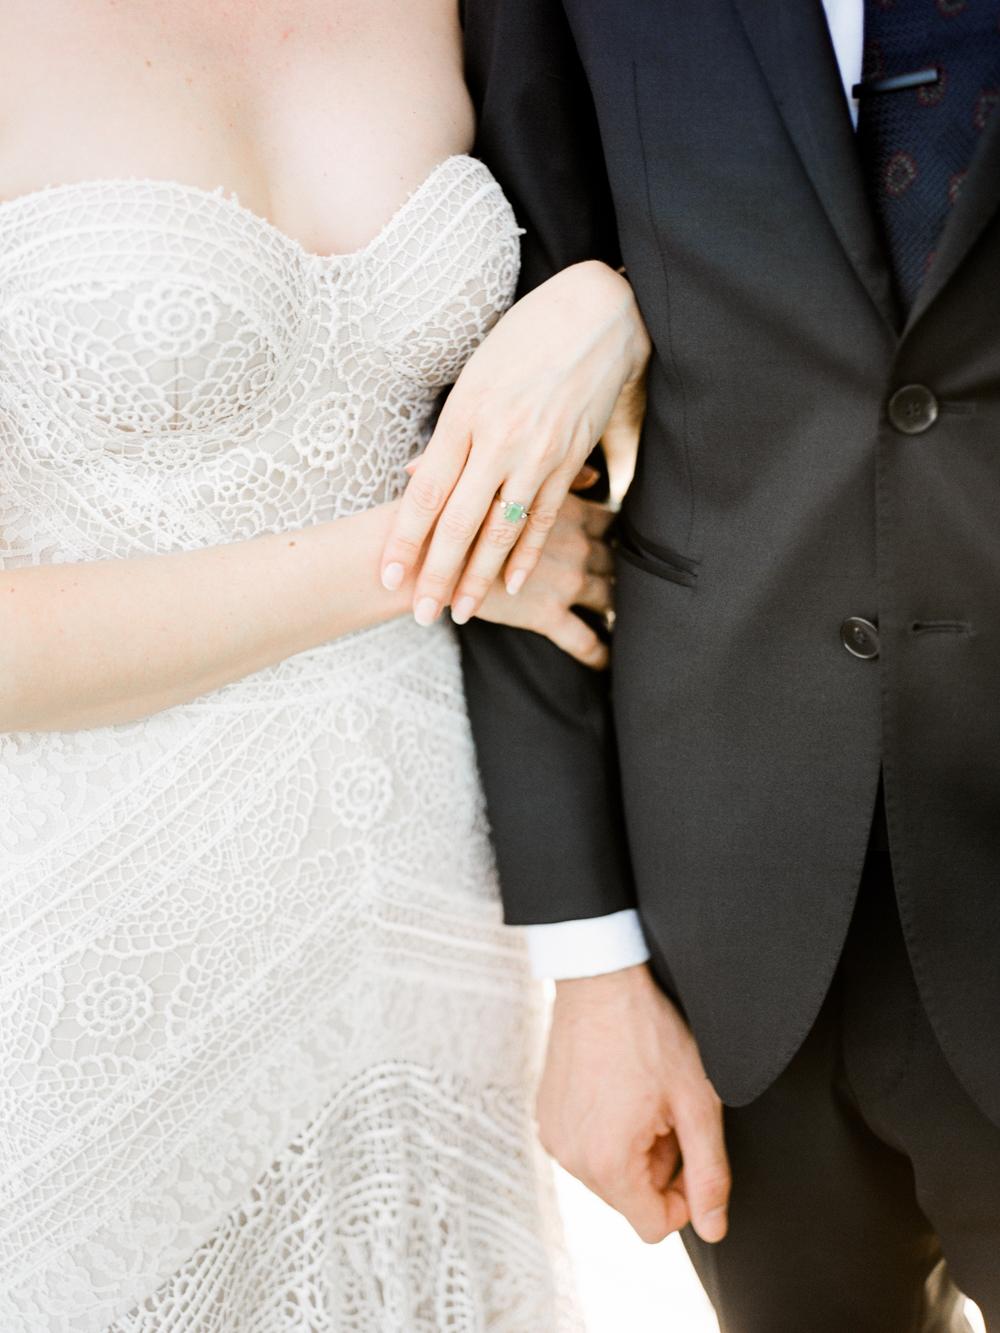 fall wedding at rothko chapel- houston wedding photographer-christine gosch - film photographer - elopement photographer- intimate wedding - lovely bride wedding gown-11.jpg